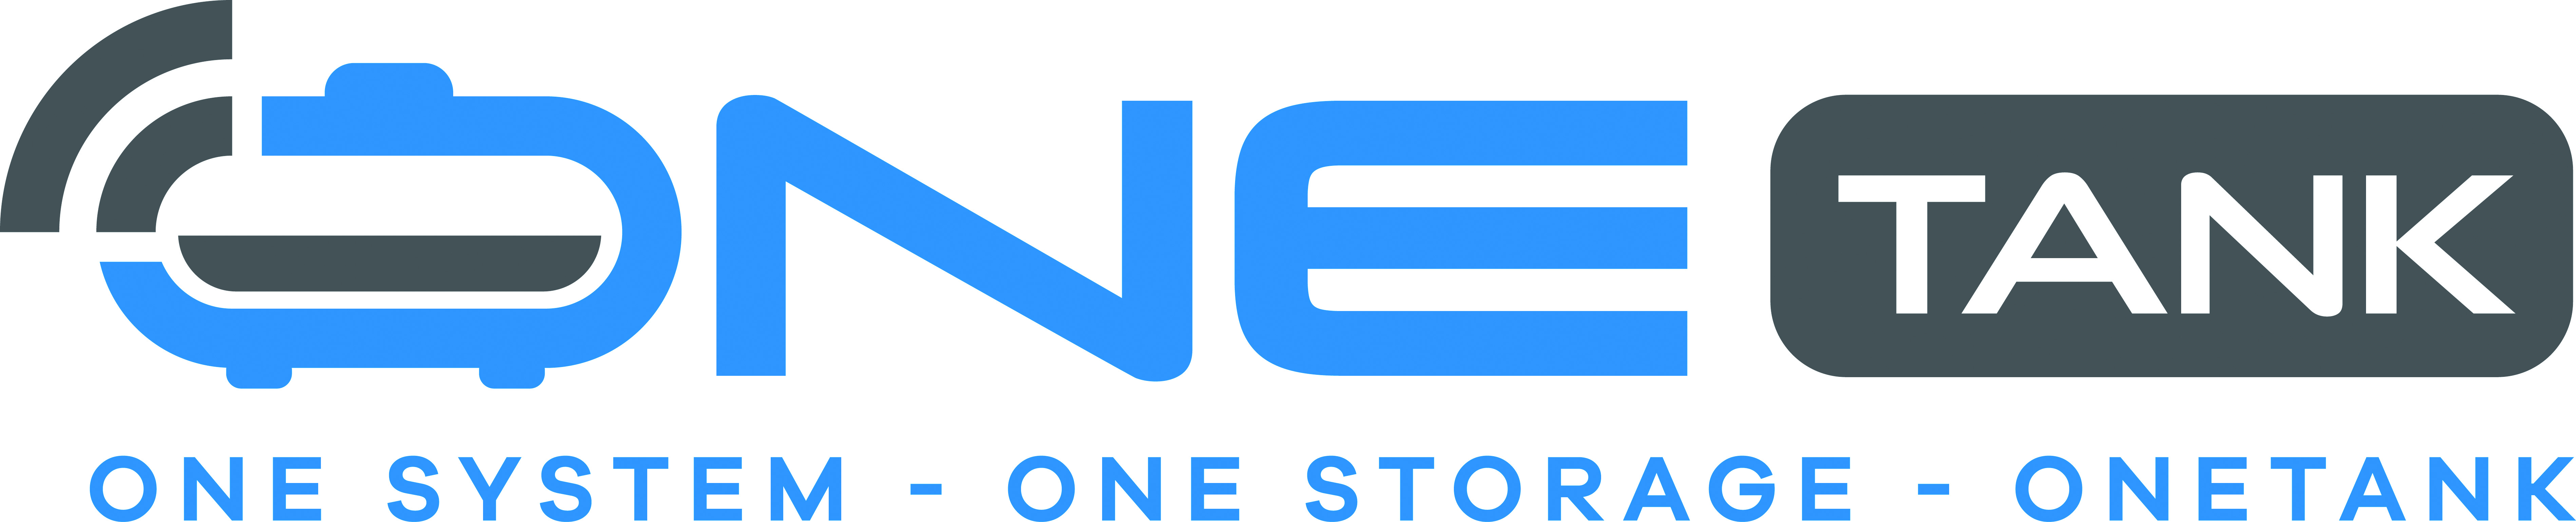 One-Tank logo